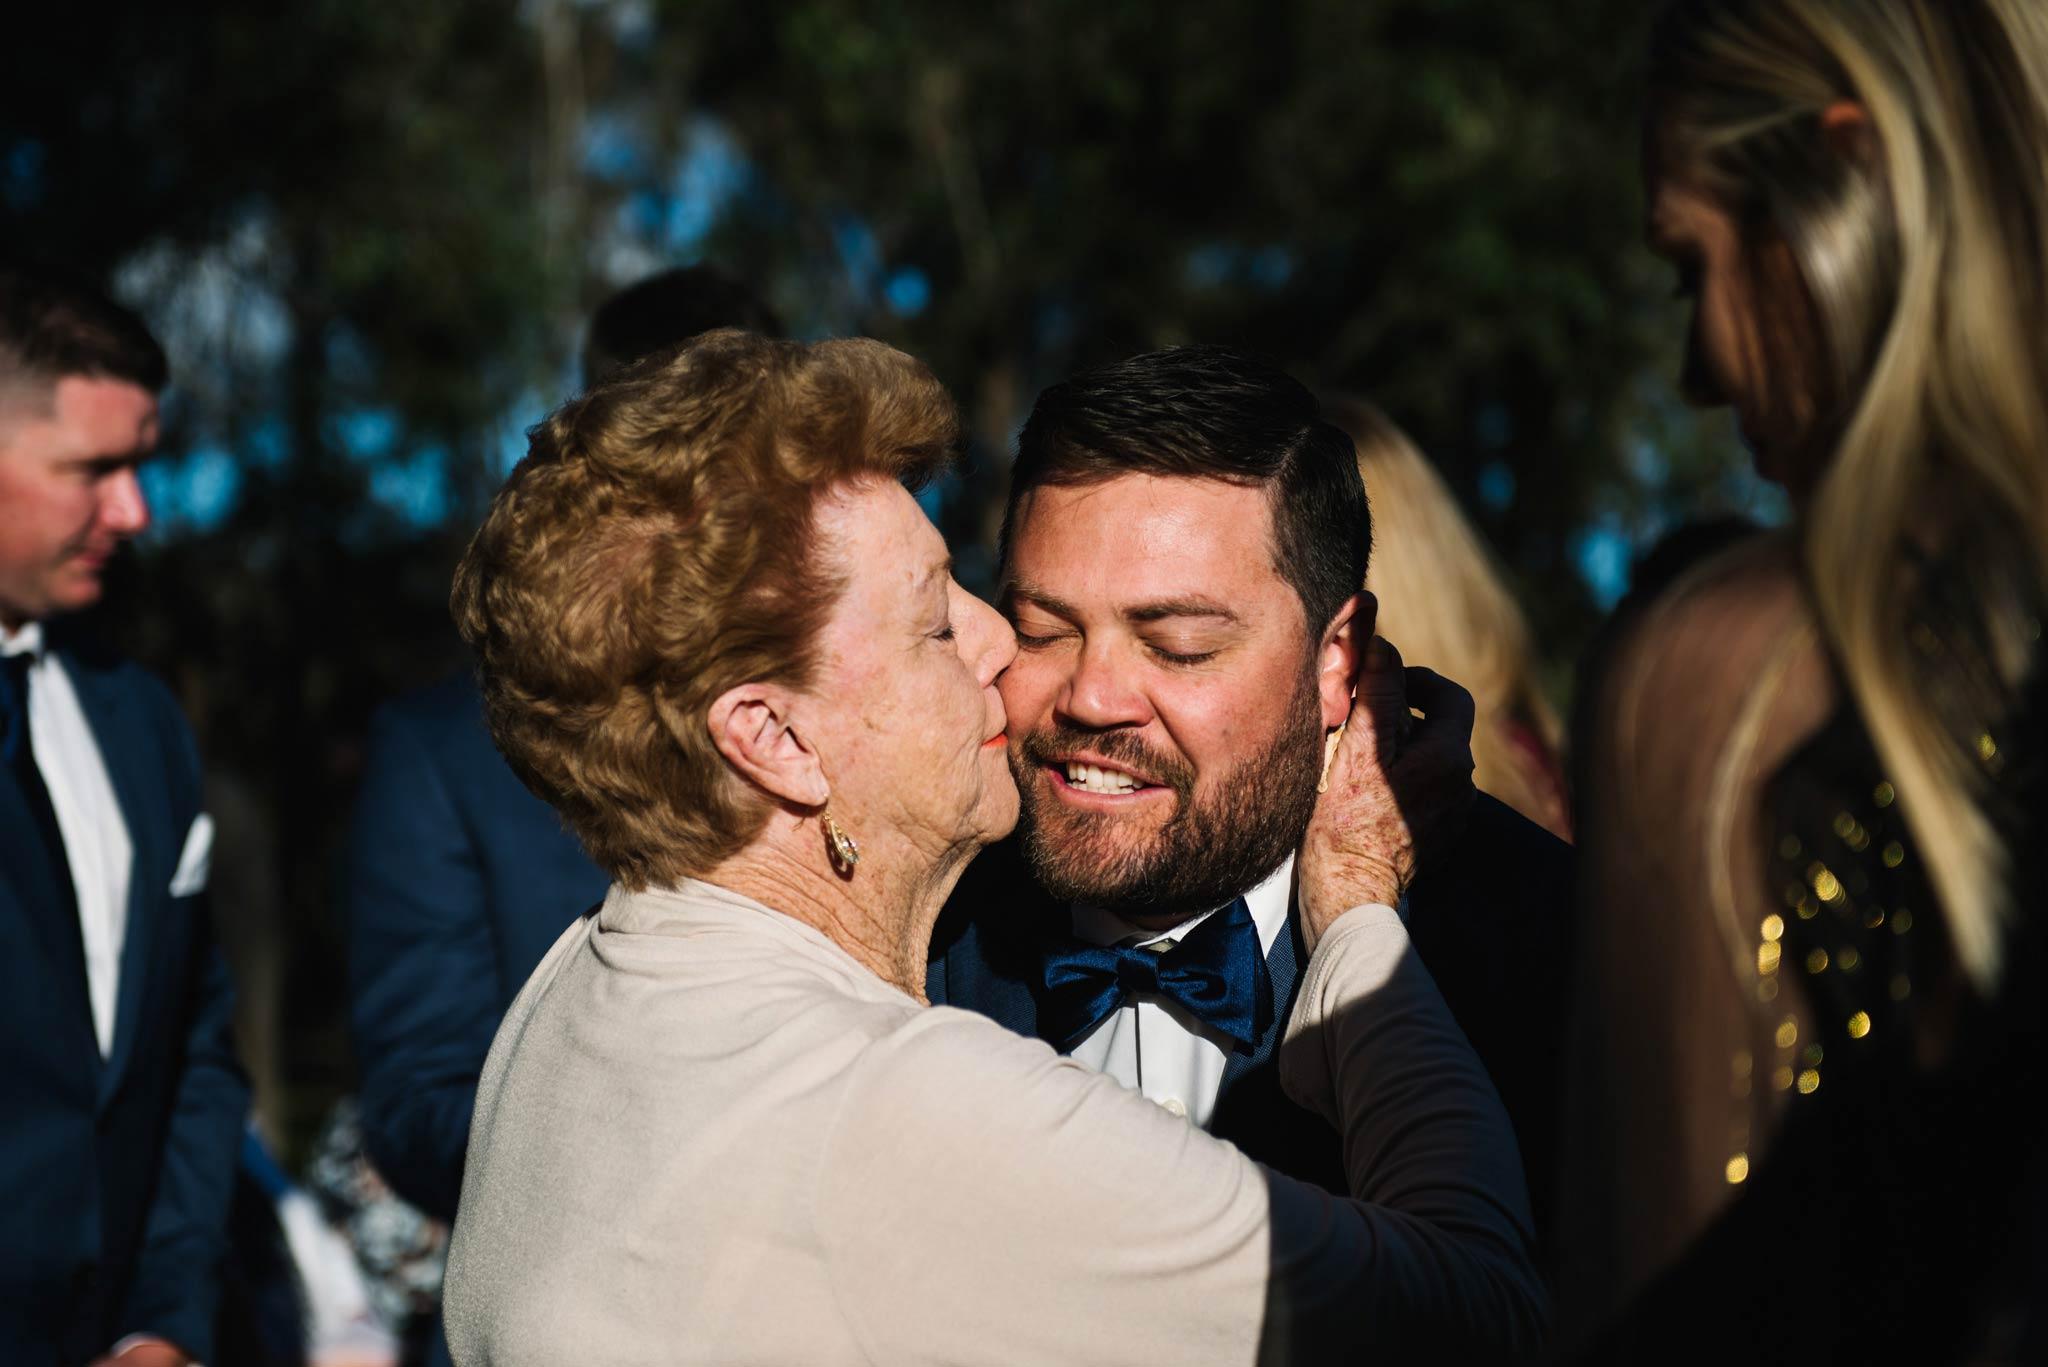 Grandma kisses groom on the cheek after wedding ceremony